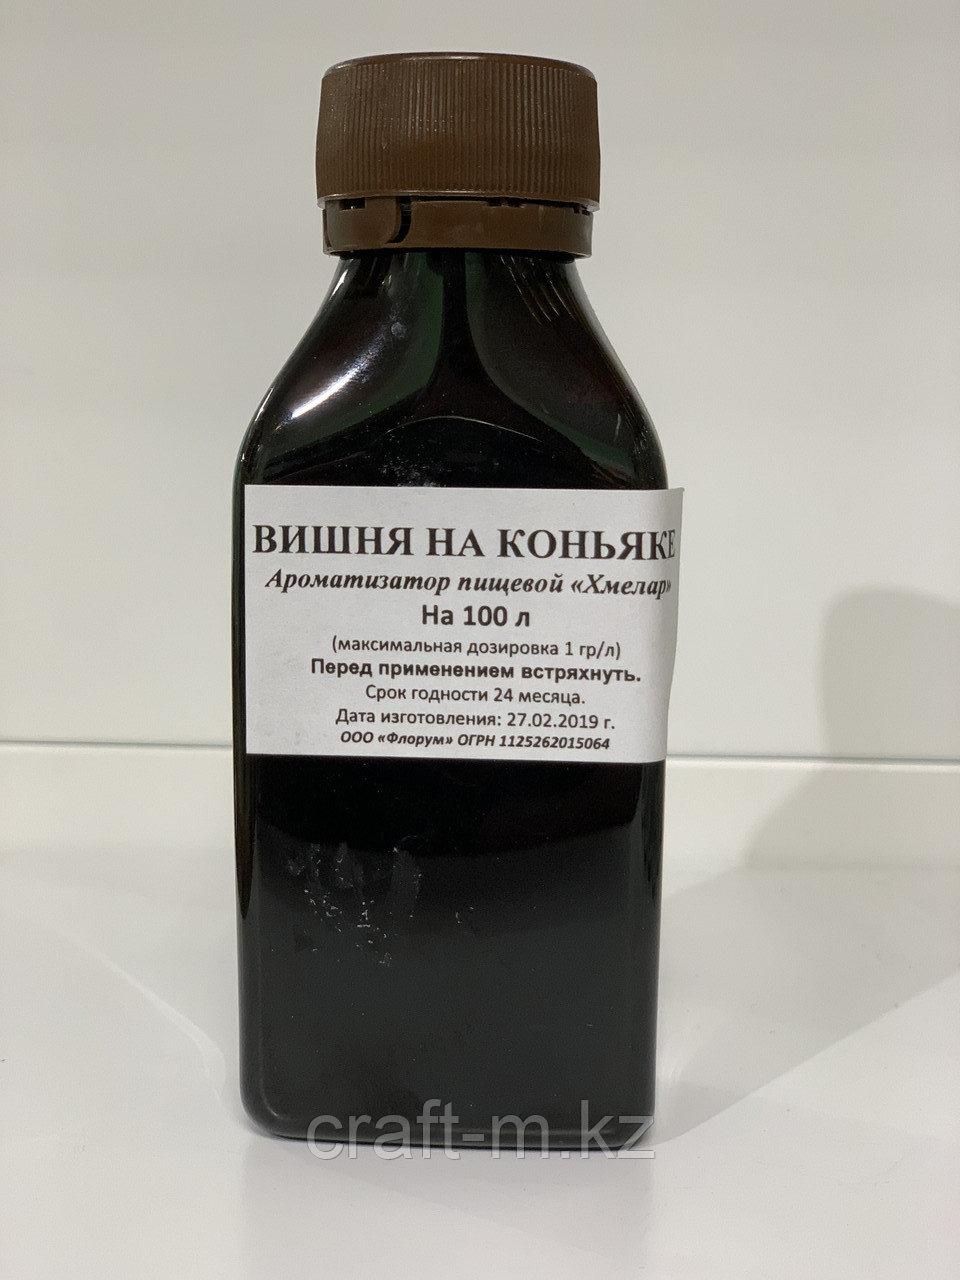 Вишня на коньяке - ароматизатор на 100л